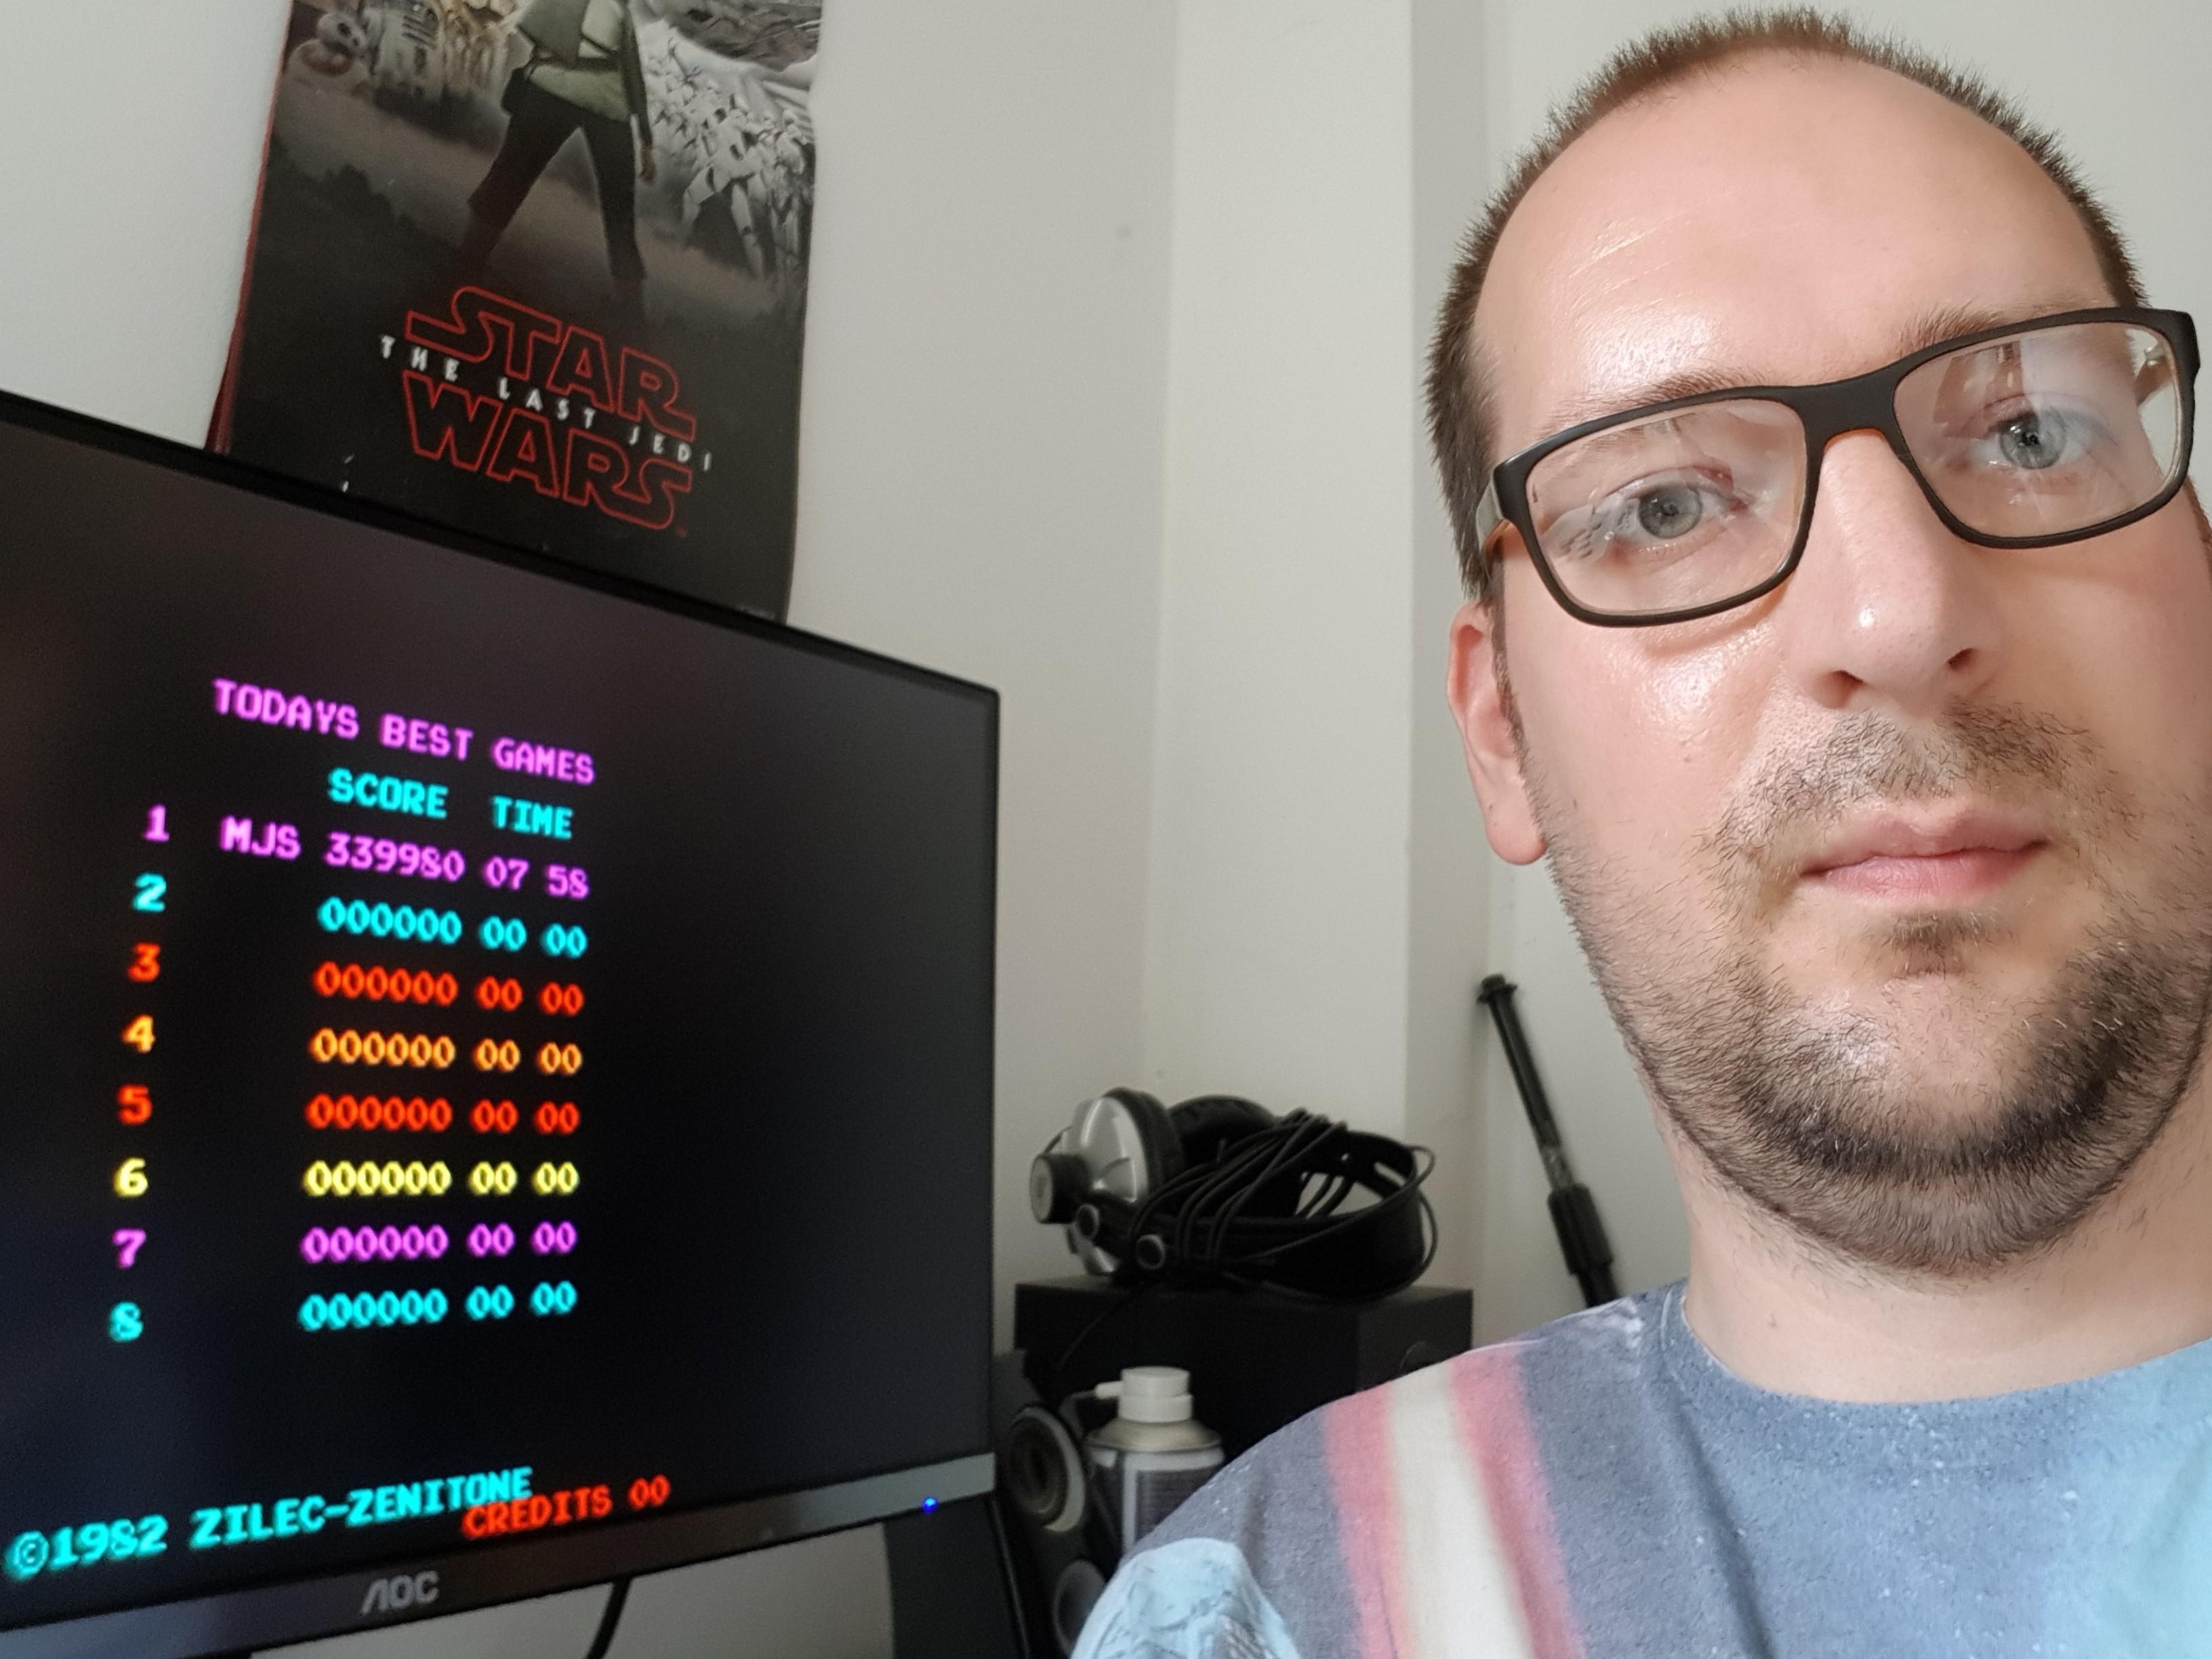 mitchuk: Check Man [checkman] (Arcade Emulated / M.A.M.E.) 339,980 points on 2018-07-28 04:11:06